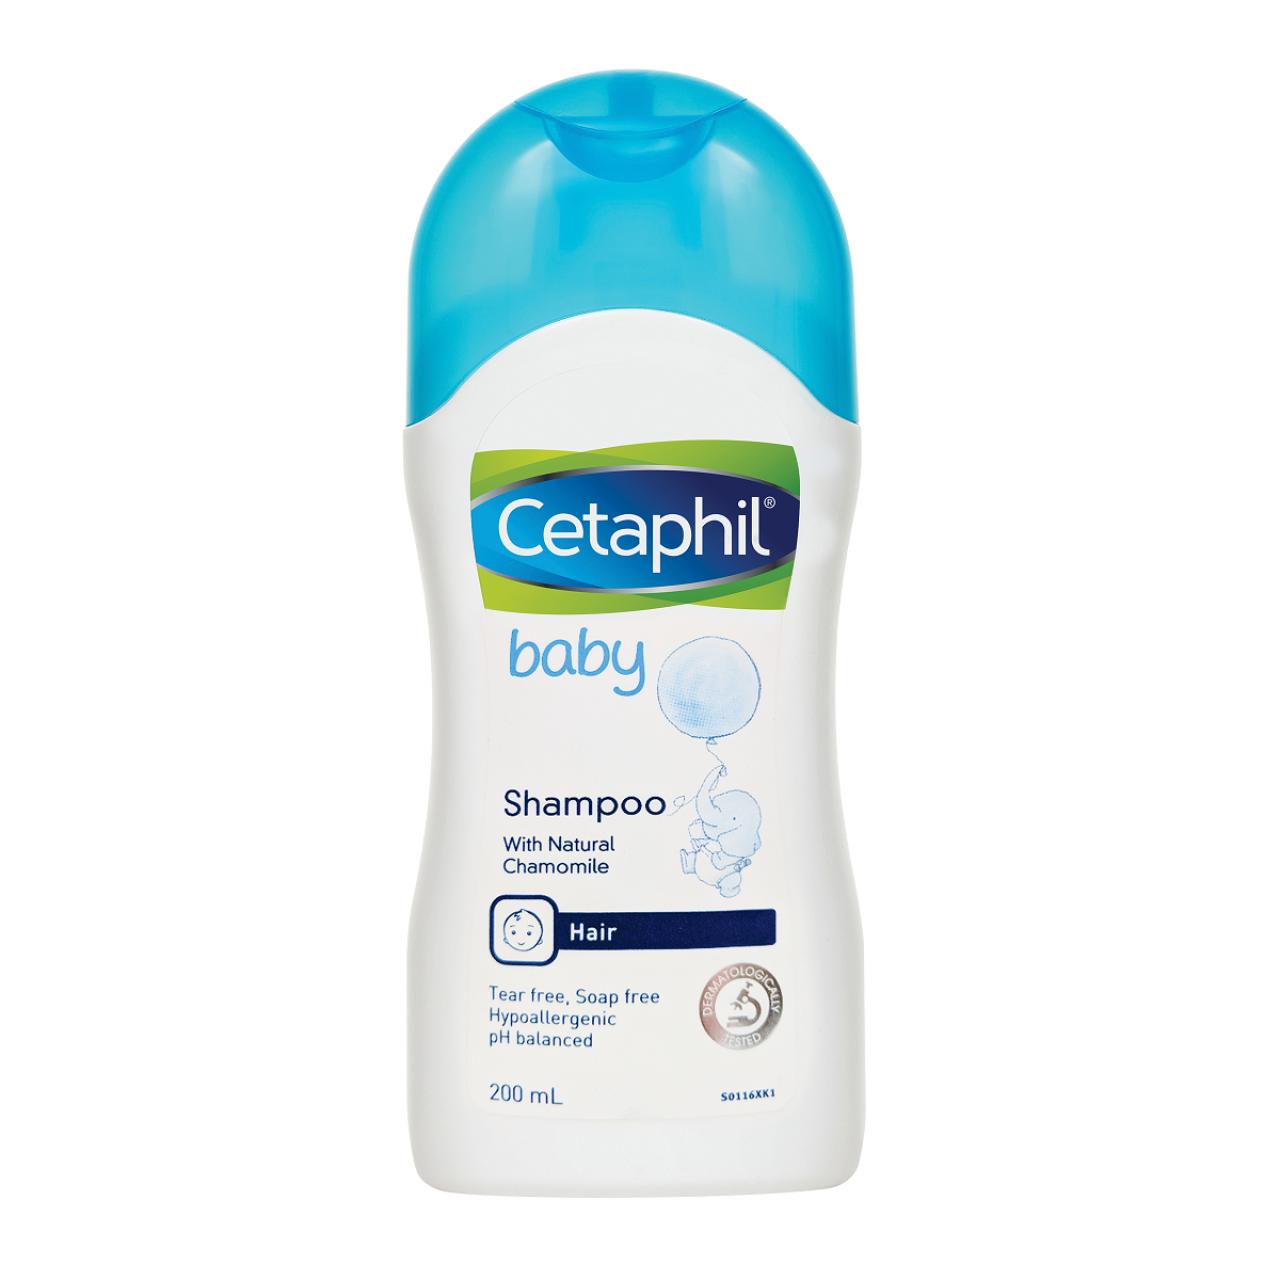 CETAPHIL BABY SHAMPOO 200ML